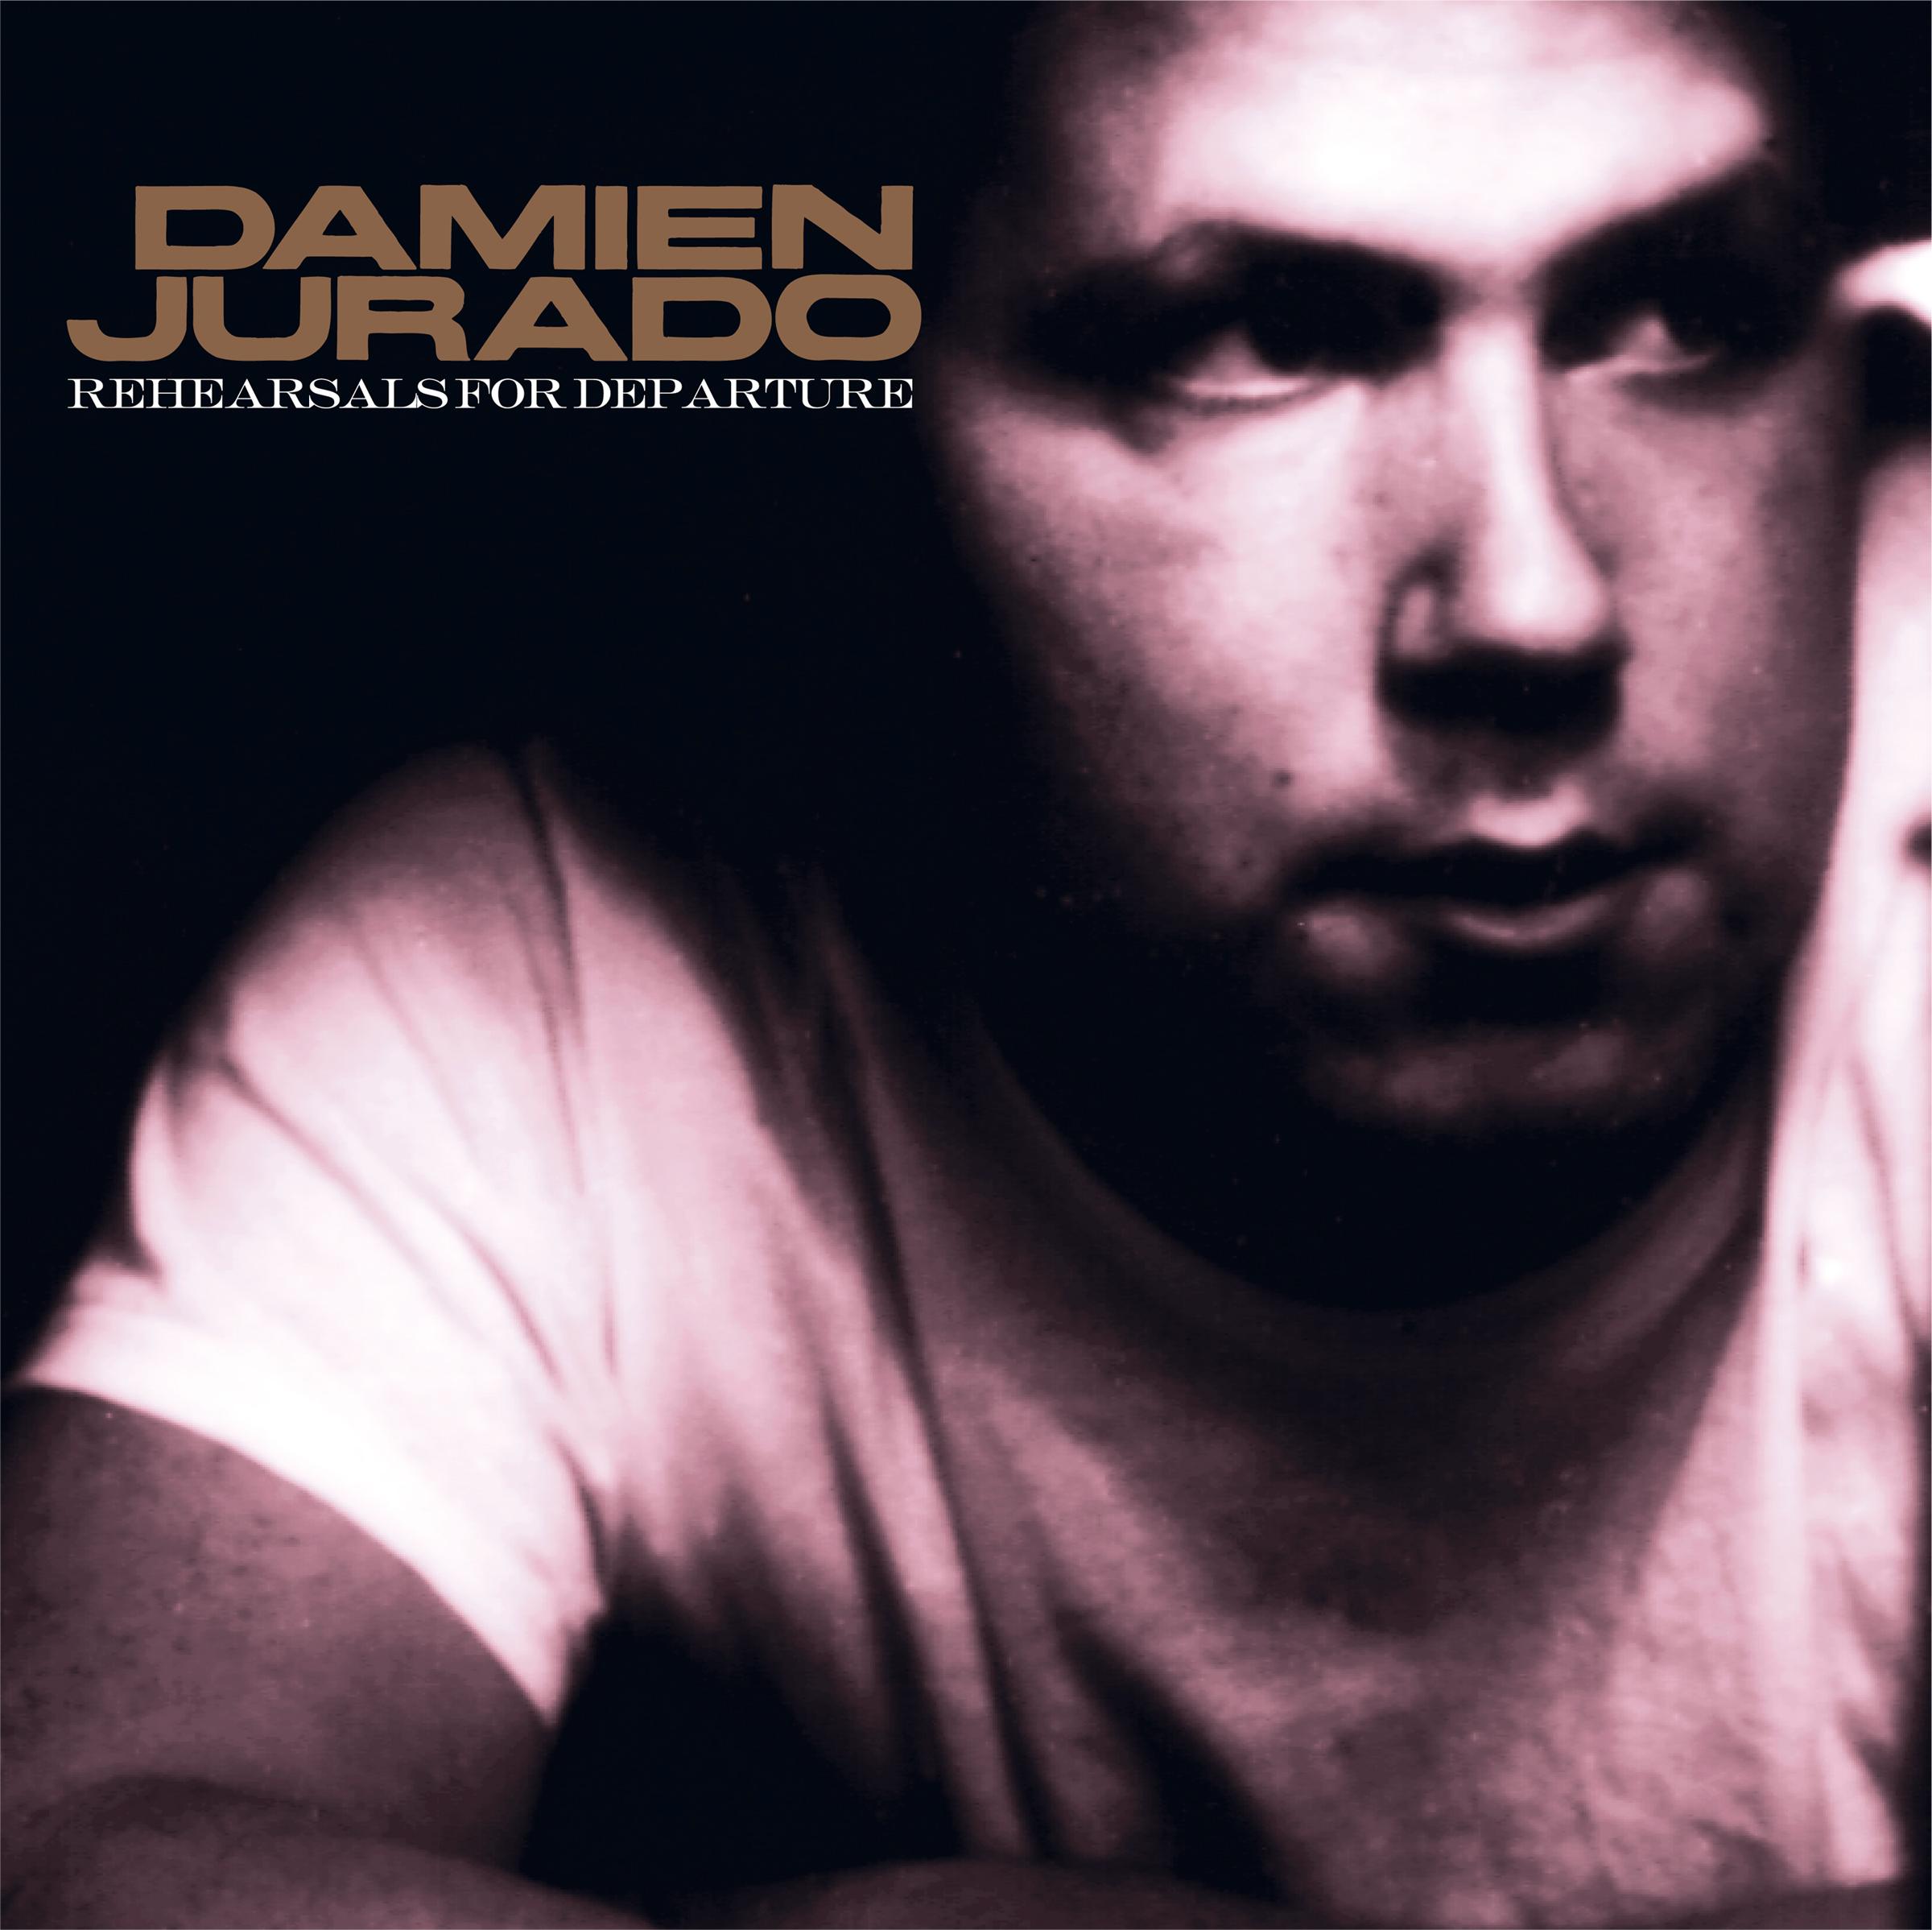 Damien Jurado - Motorbike